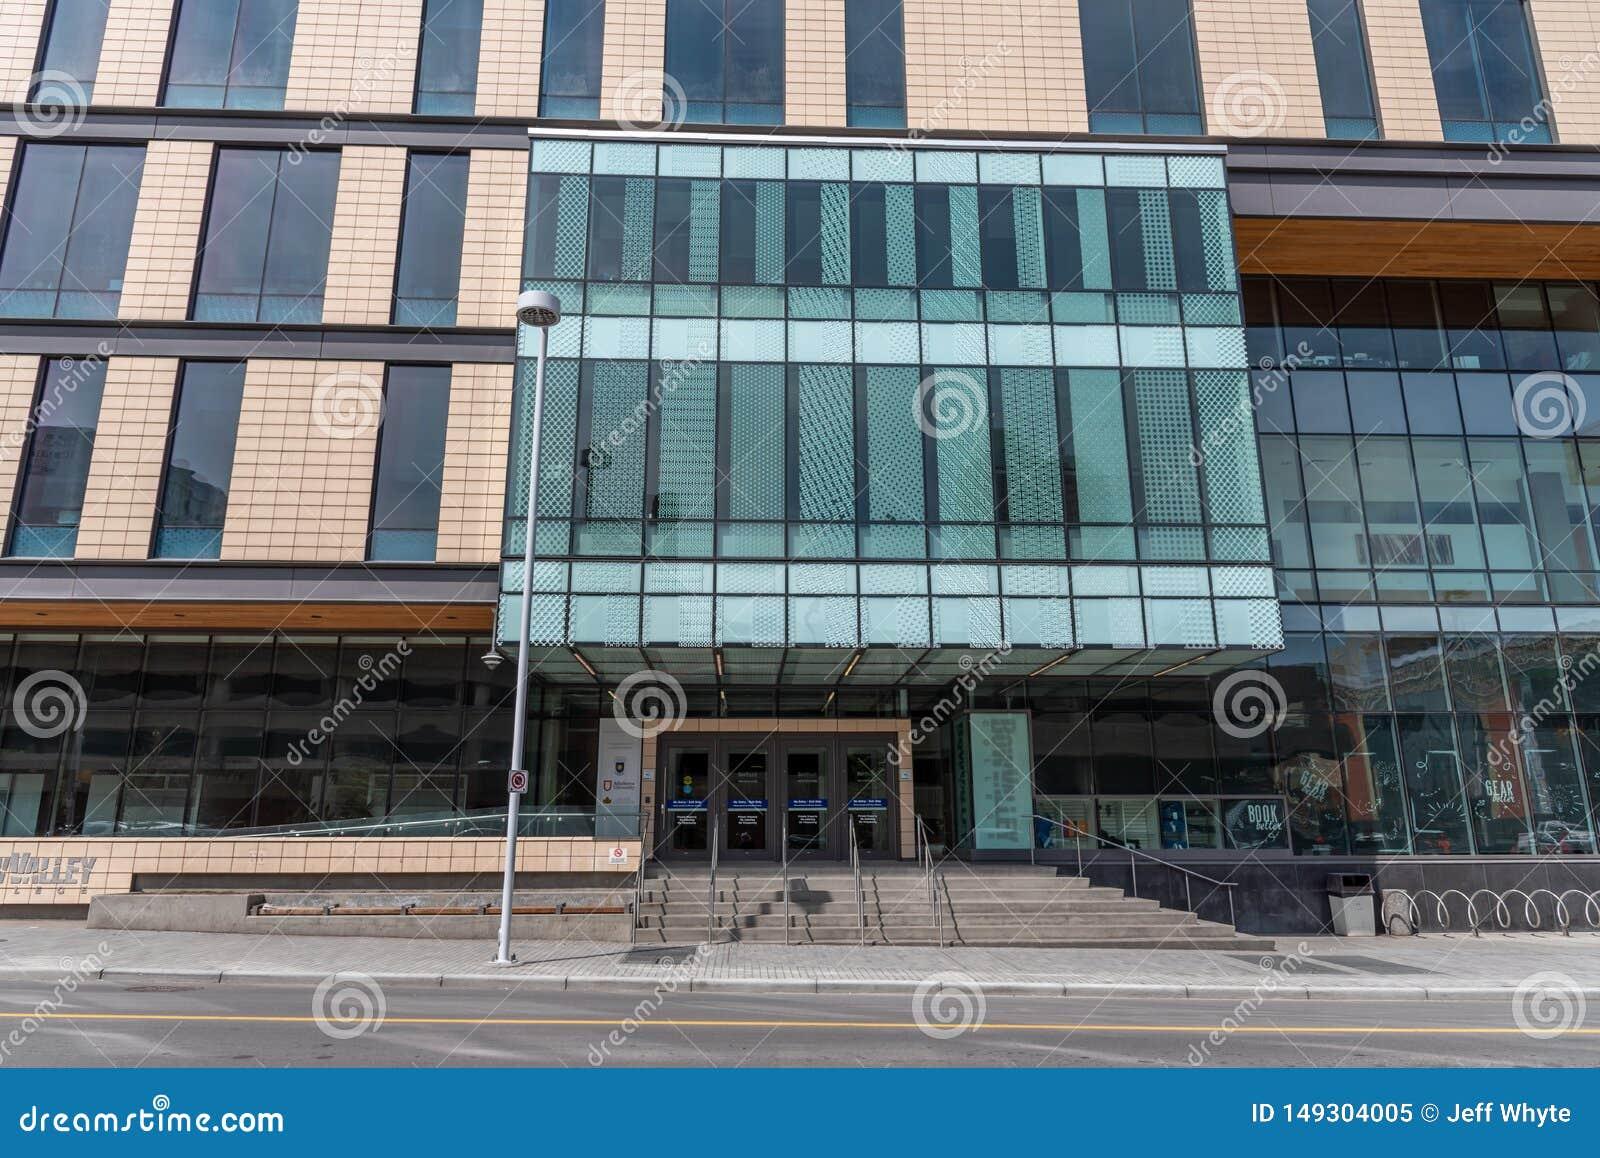 FWBA Architects - Lethbridge, Calgary, Medicine Hat and